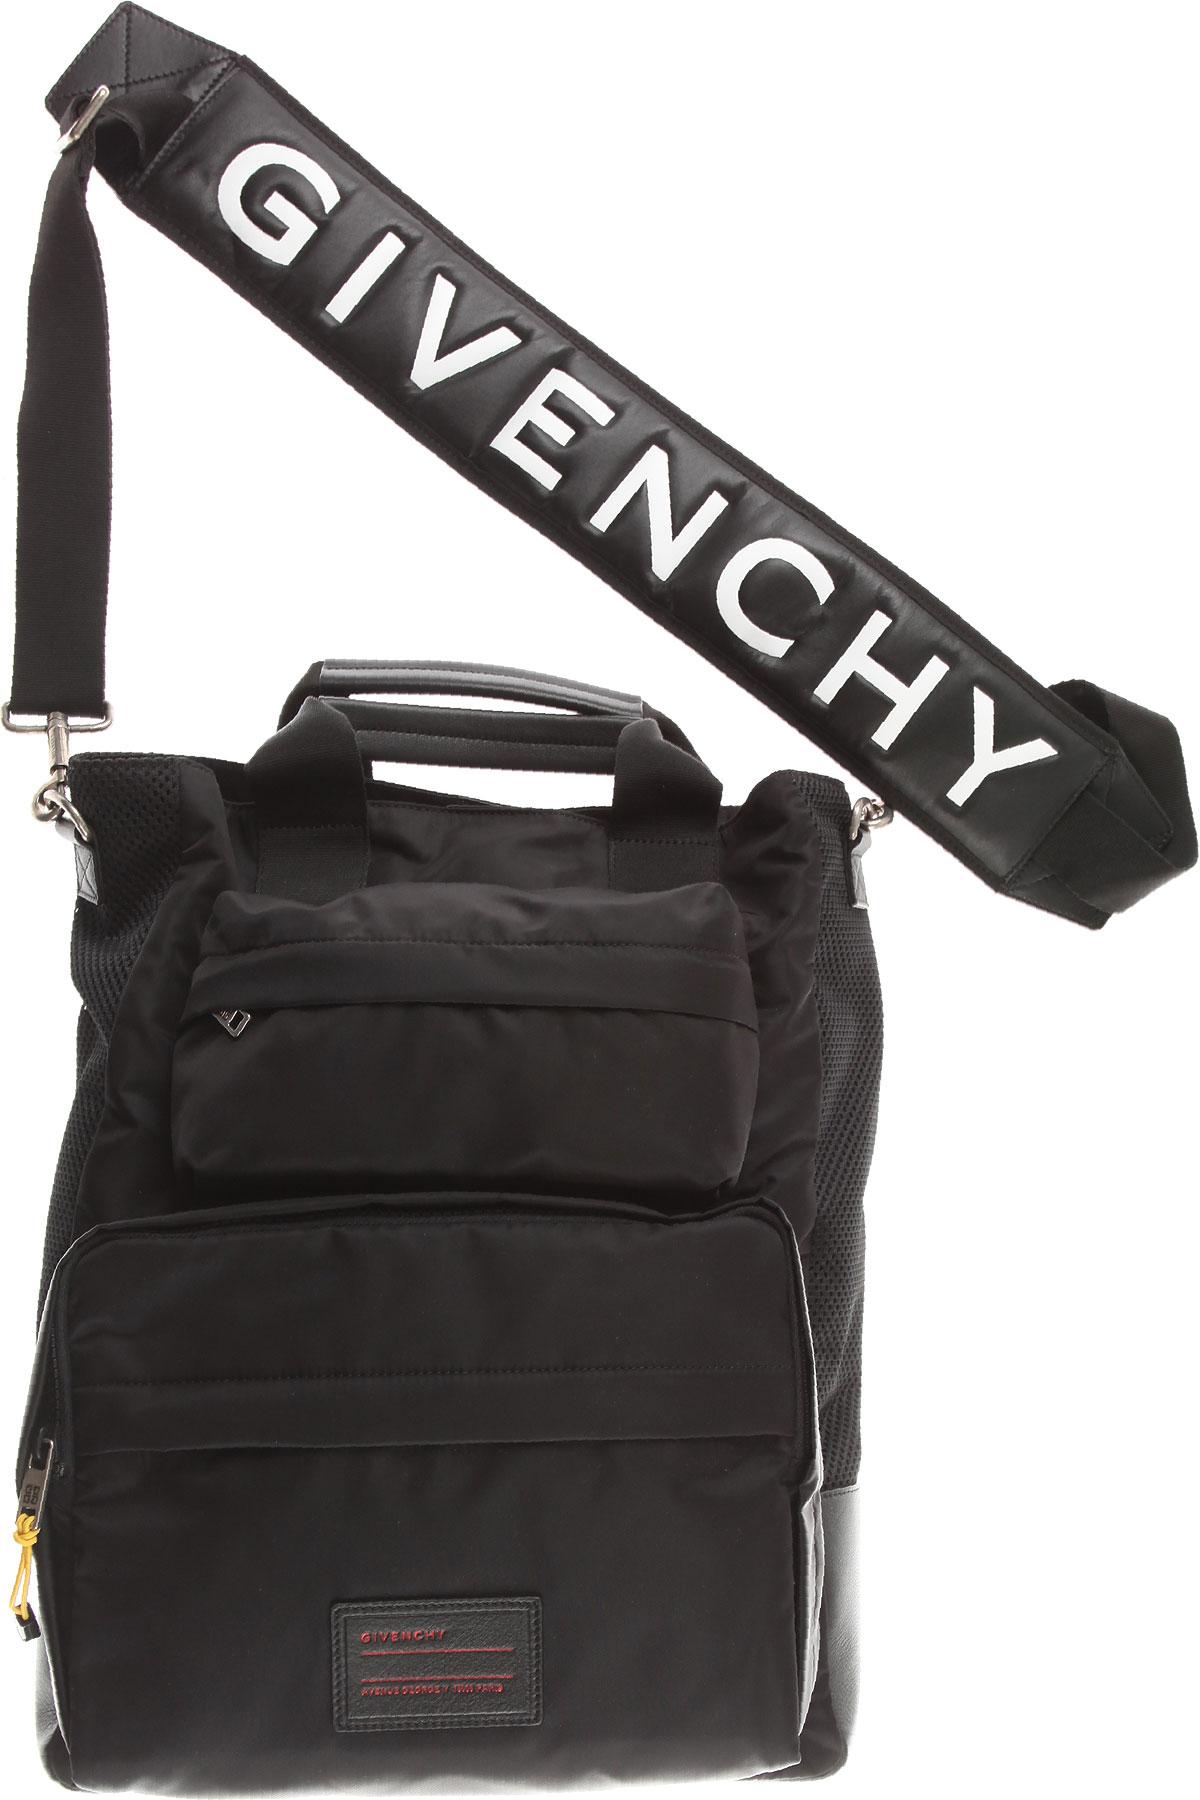 Image of Givenchy Shoulder Bags, Black, Nylon, 2017